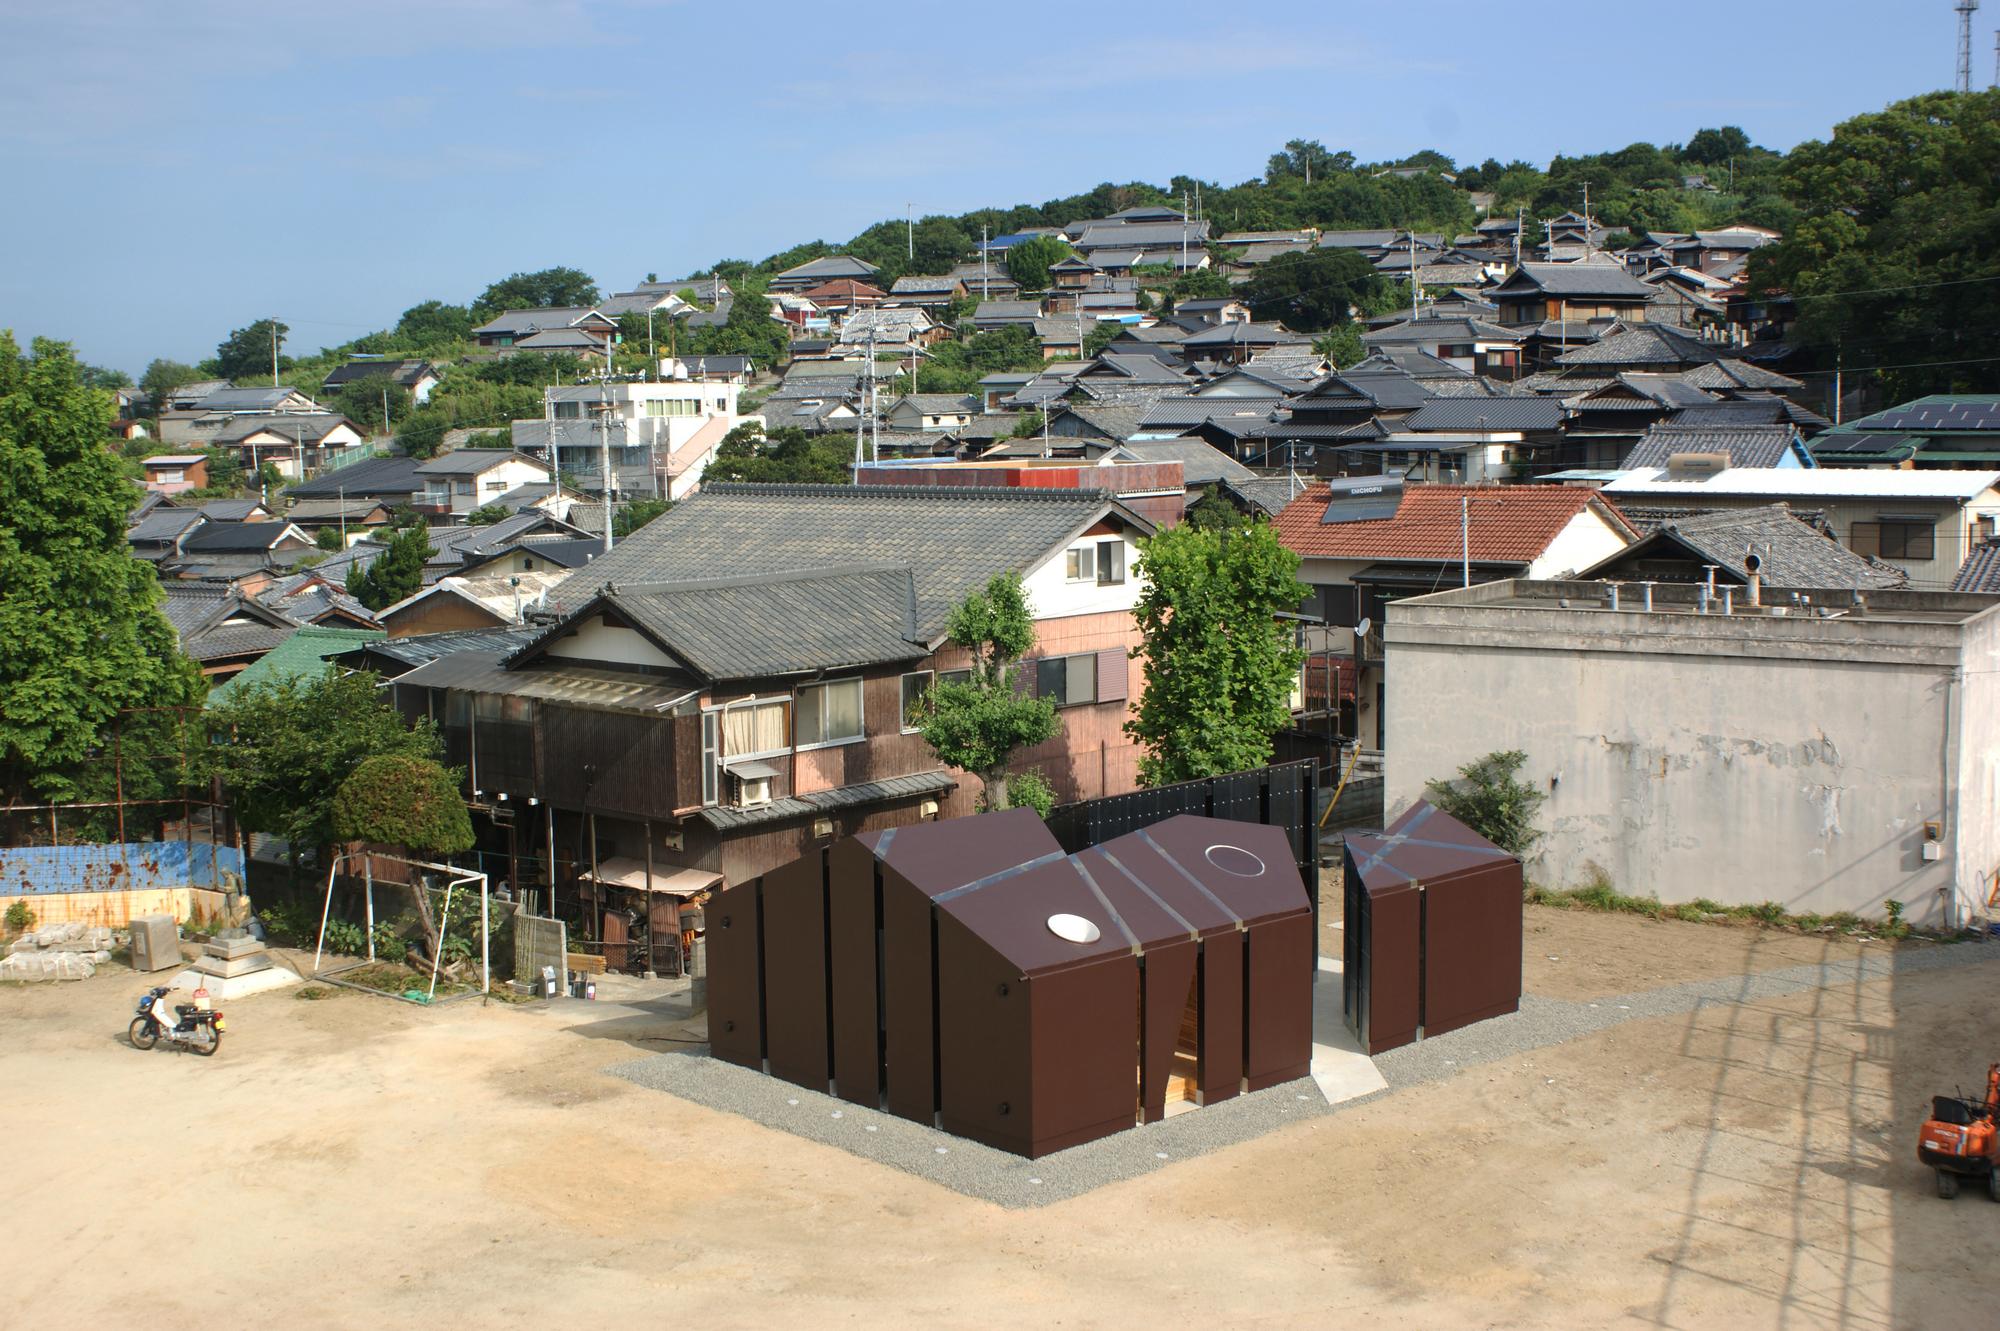 House of Toilet - House of Toilet